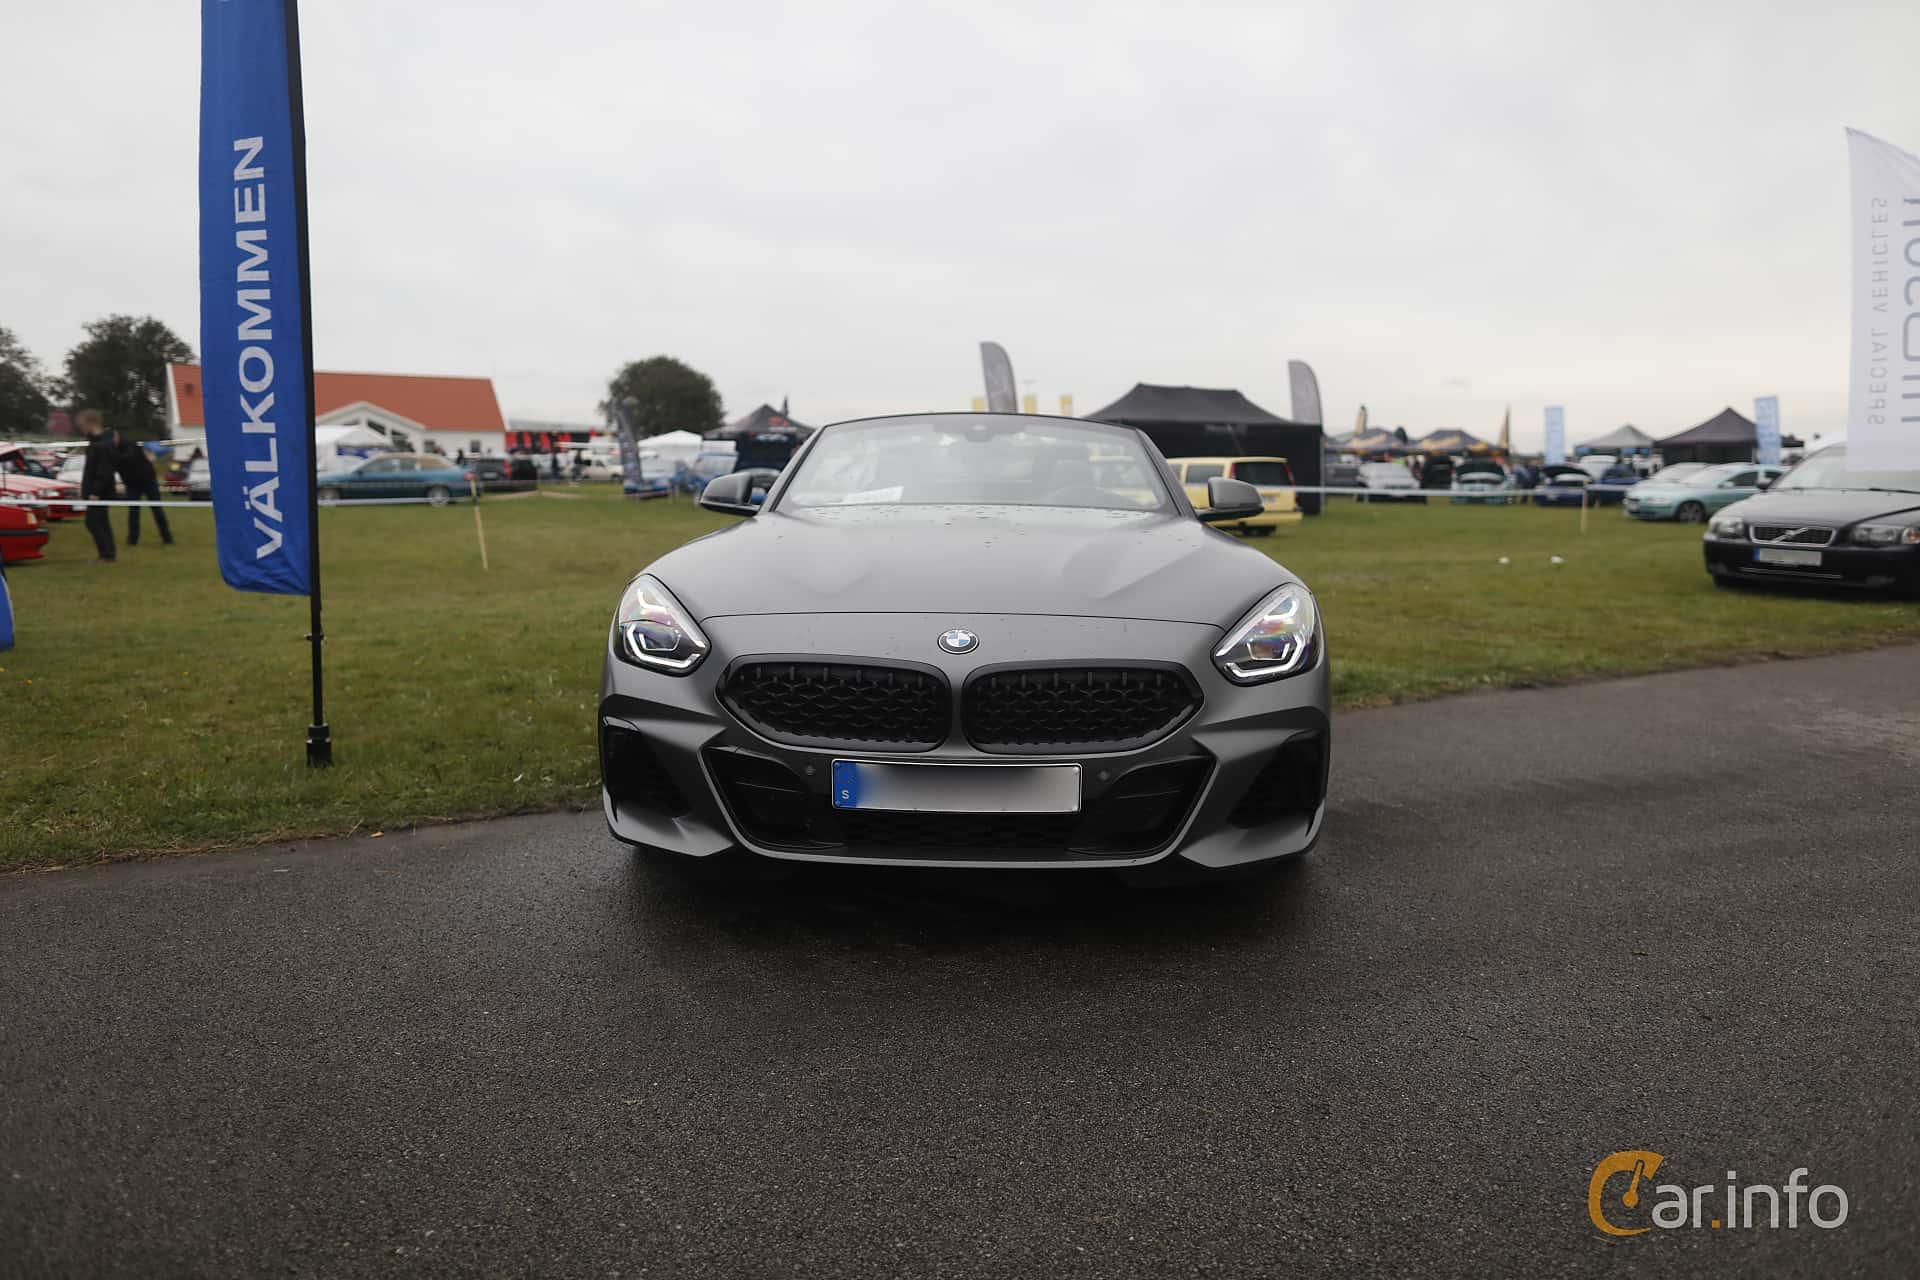 BMW Z4 M40i  Steptronic, 340hp, 2019 at Vallåkraträffen 2019